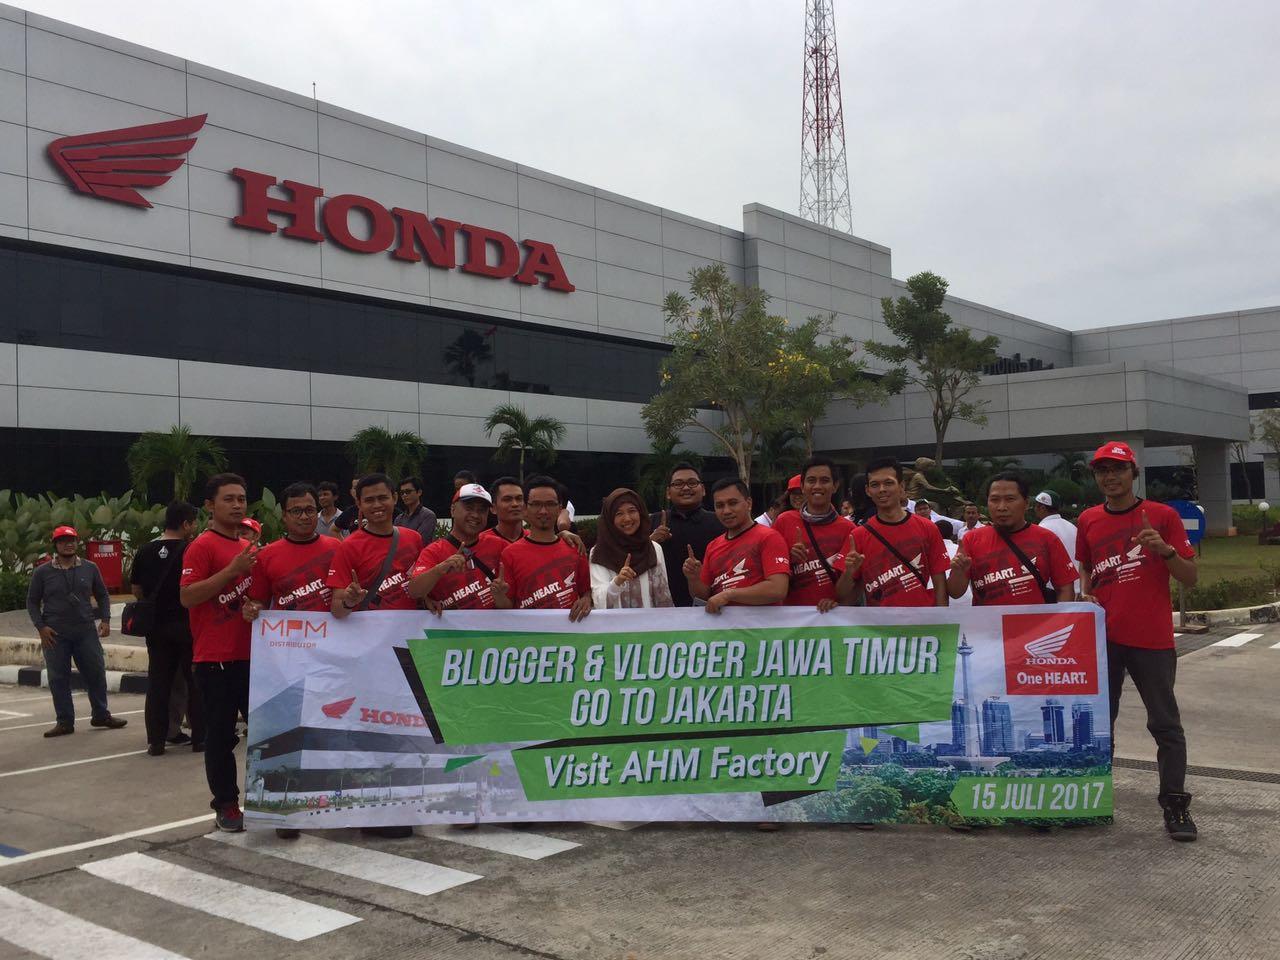 Blogger dan Vlogger Jawa Timur kunjungi pabrik motor Honda di Plant Karawang Juli tahun 2017 (5)